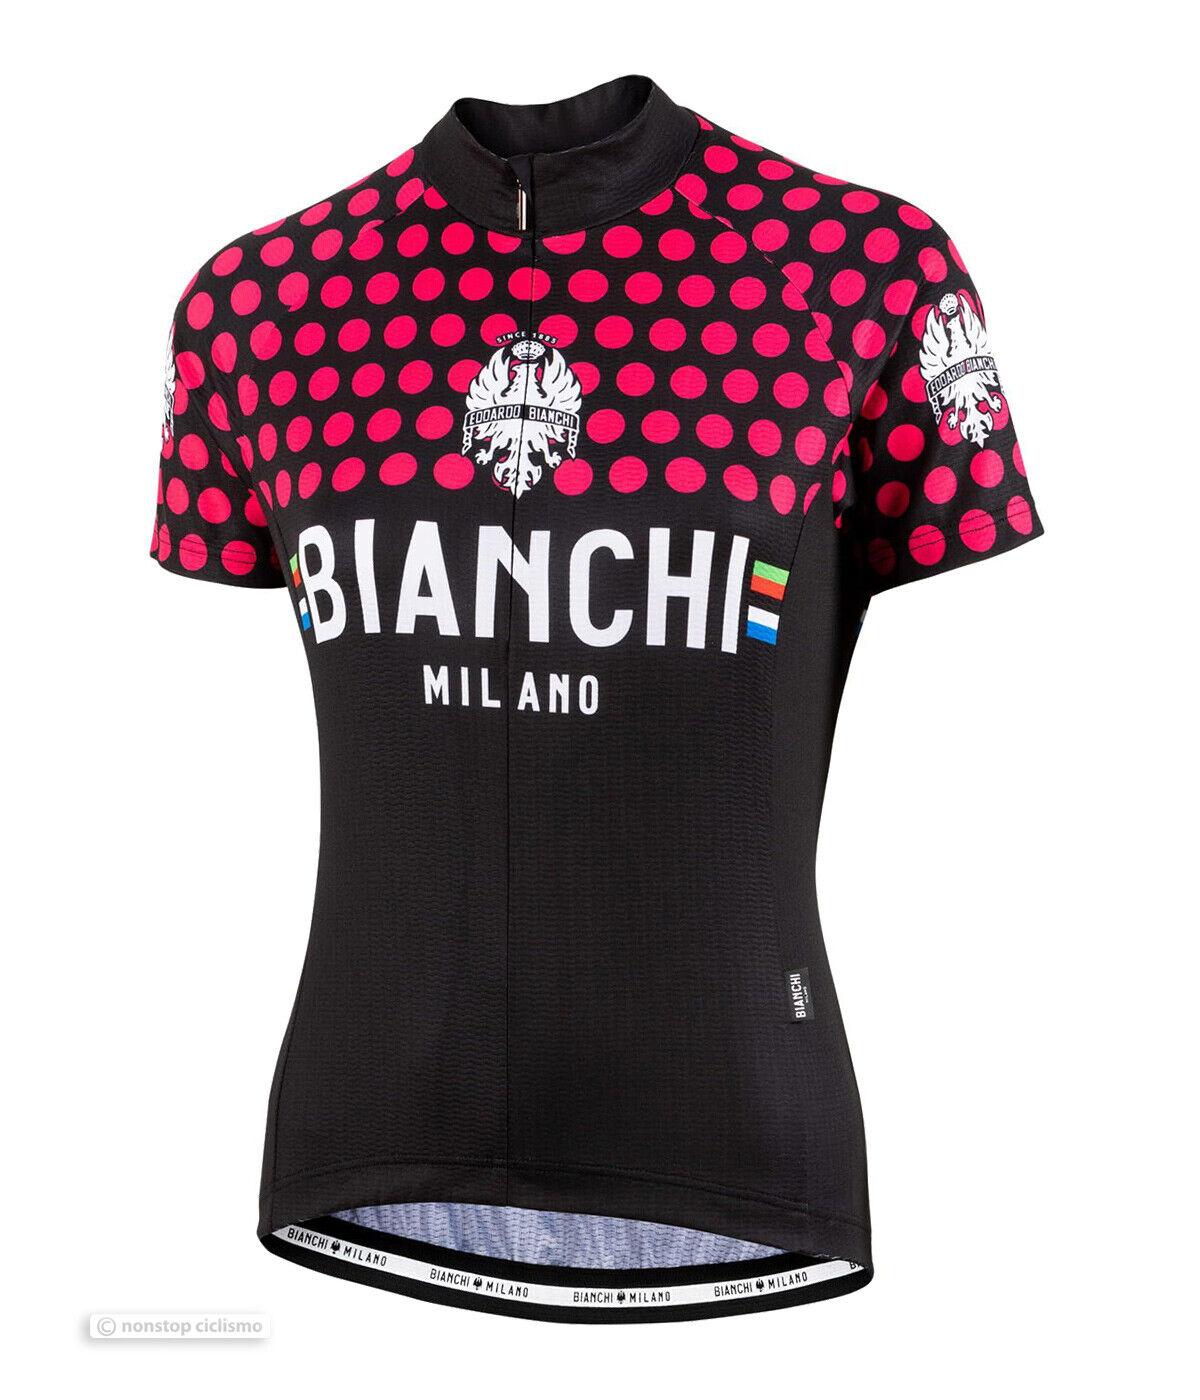 Neu Bian  Milano Crosia Damen Radsport Jersey Kurzär ig: Schwarz/Pink